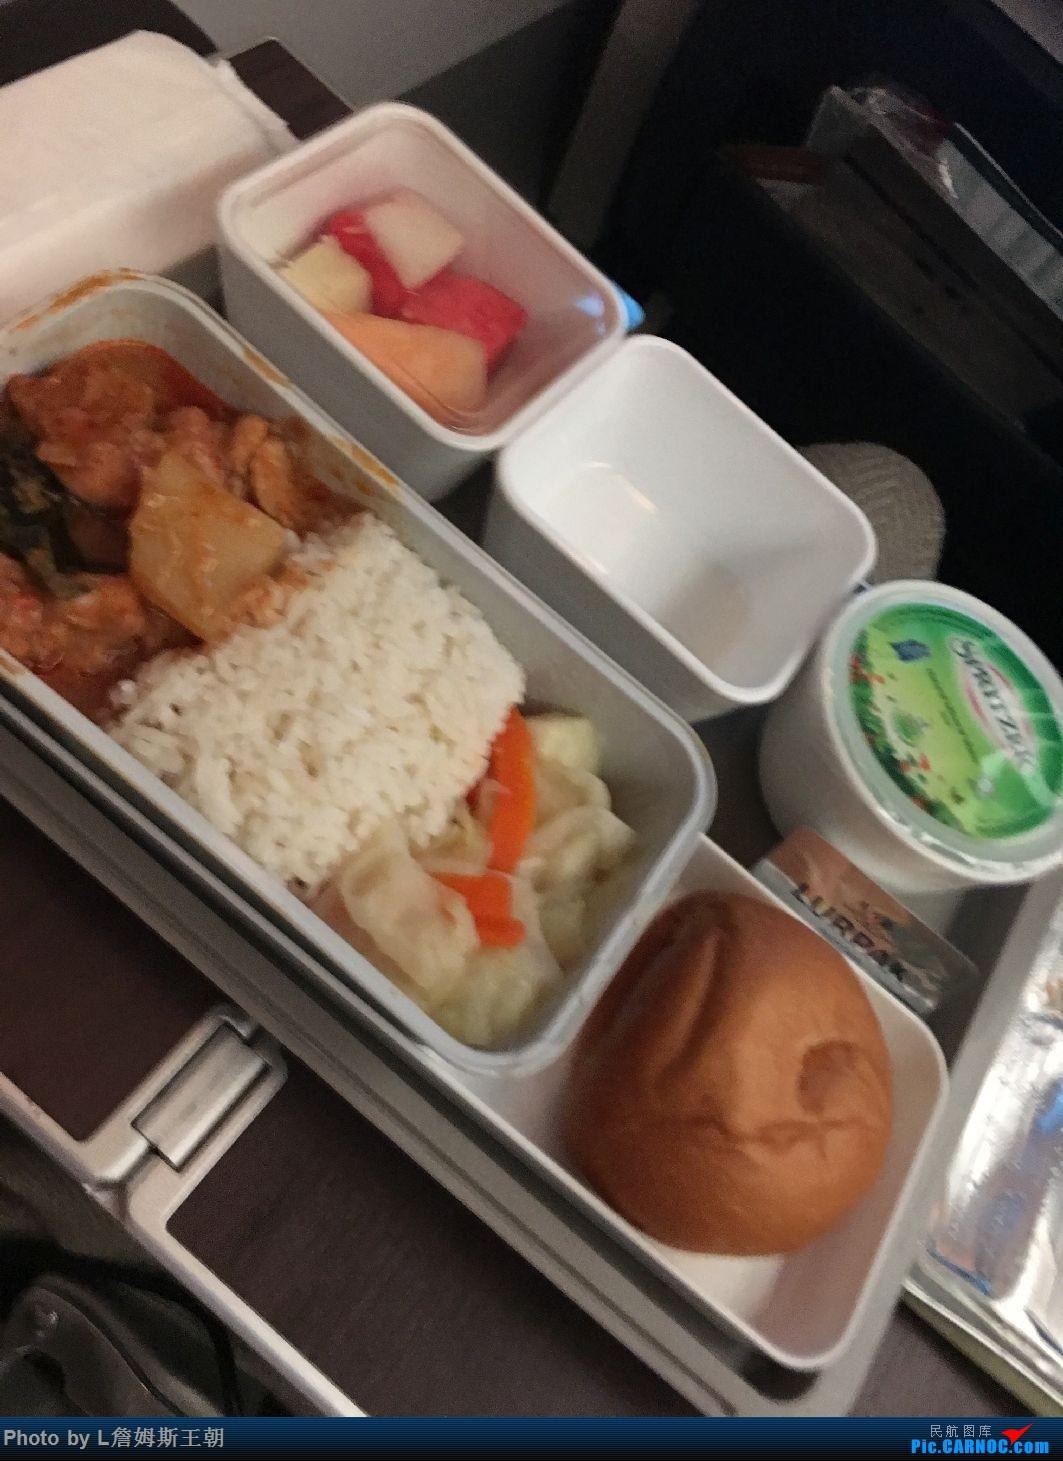 Re:【厦门飞友】King16:暑期泰国,大马游玩往返升舱。上集(国泰A359飞曼谷,升超经体验) AIRBUS A350-900 B-LRN